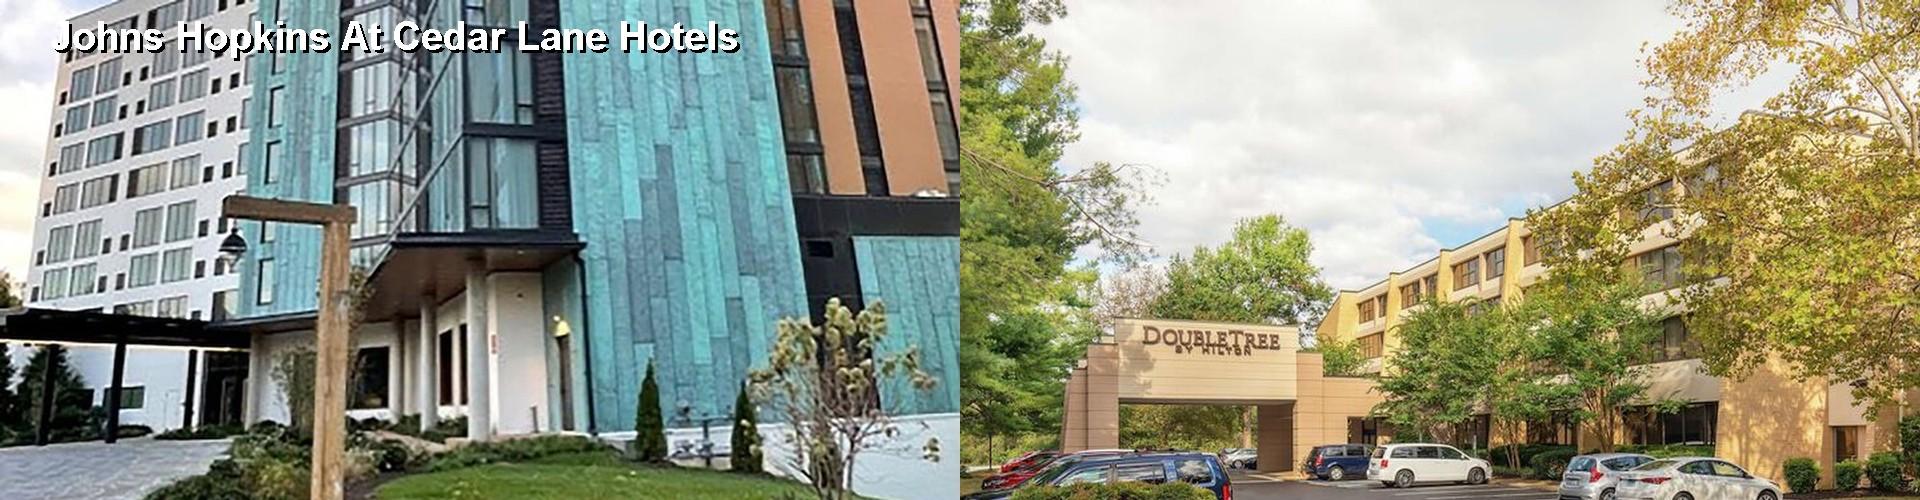 5 Best Hotels Near Johns Hopkins At Cedar Lane